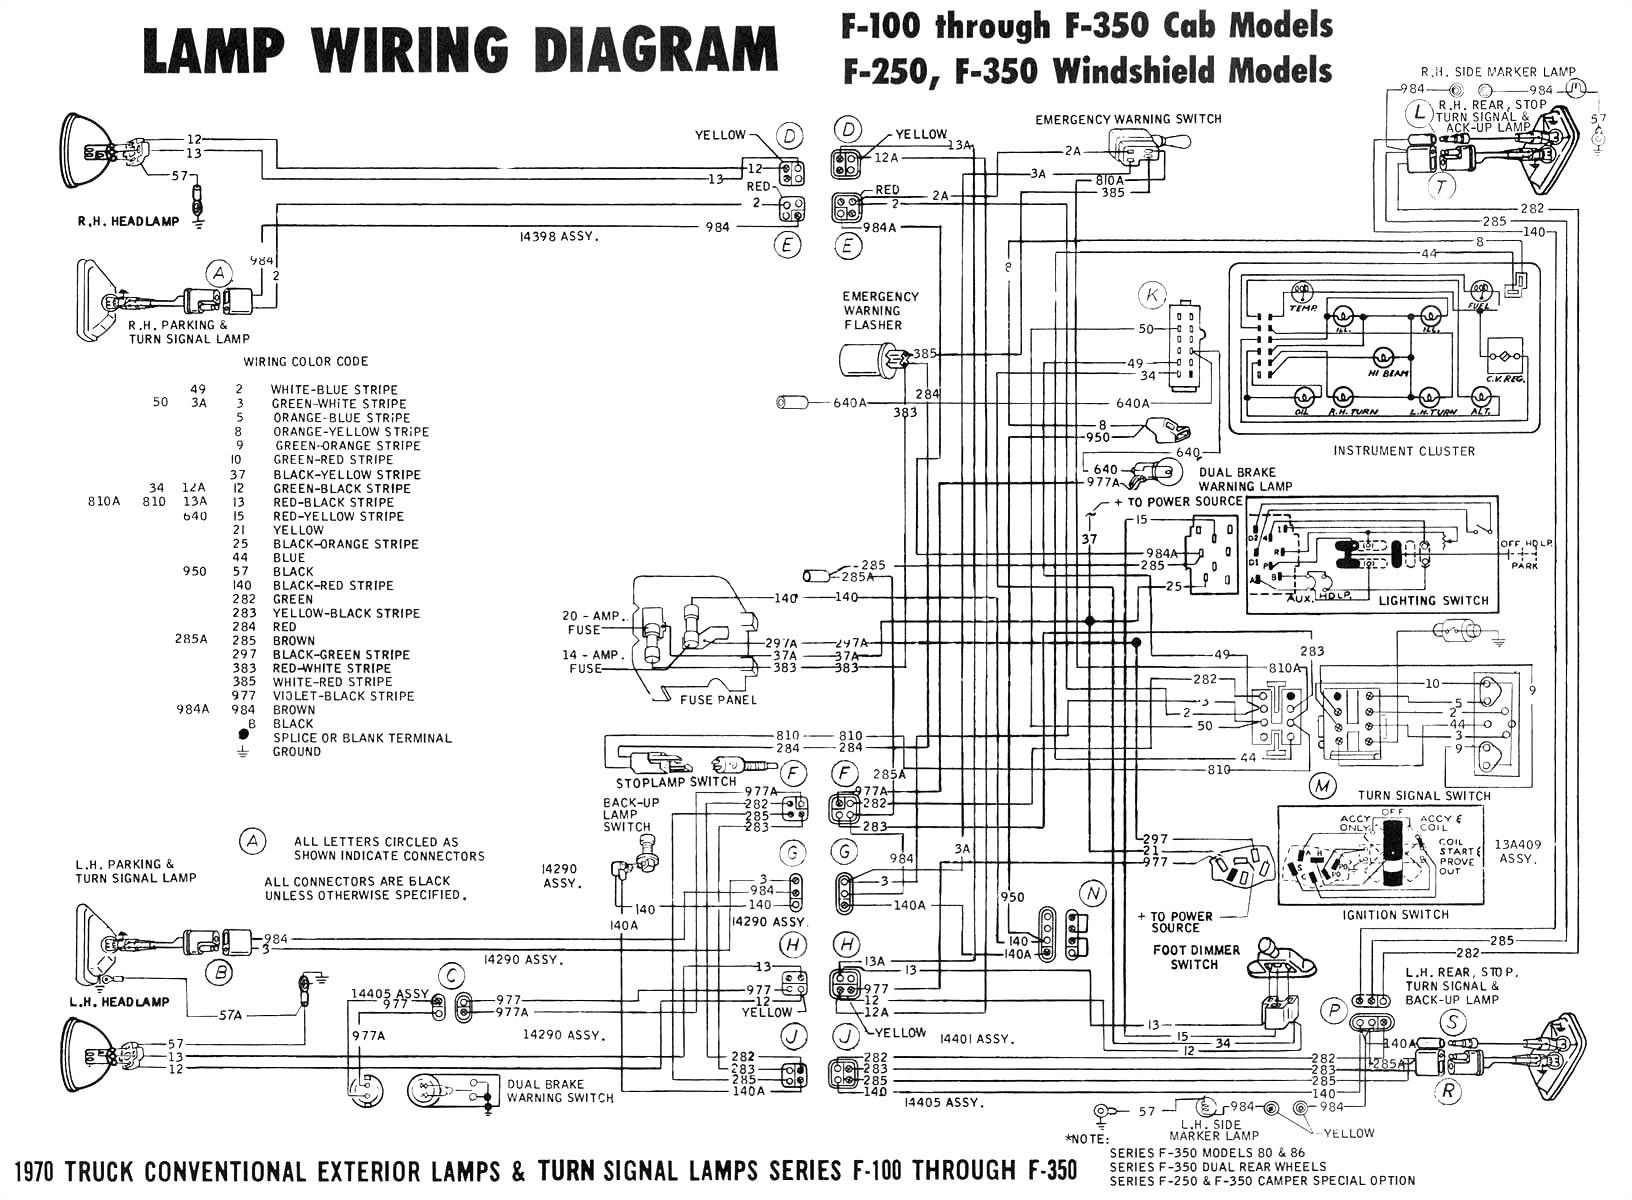 05 f150 fuse box diagram luxury diagram also 2006 ford f 150 trailer fuses on 05 ford f 350 rear end of 05 f150 fuse box diagram jpg